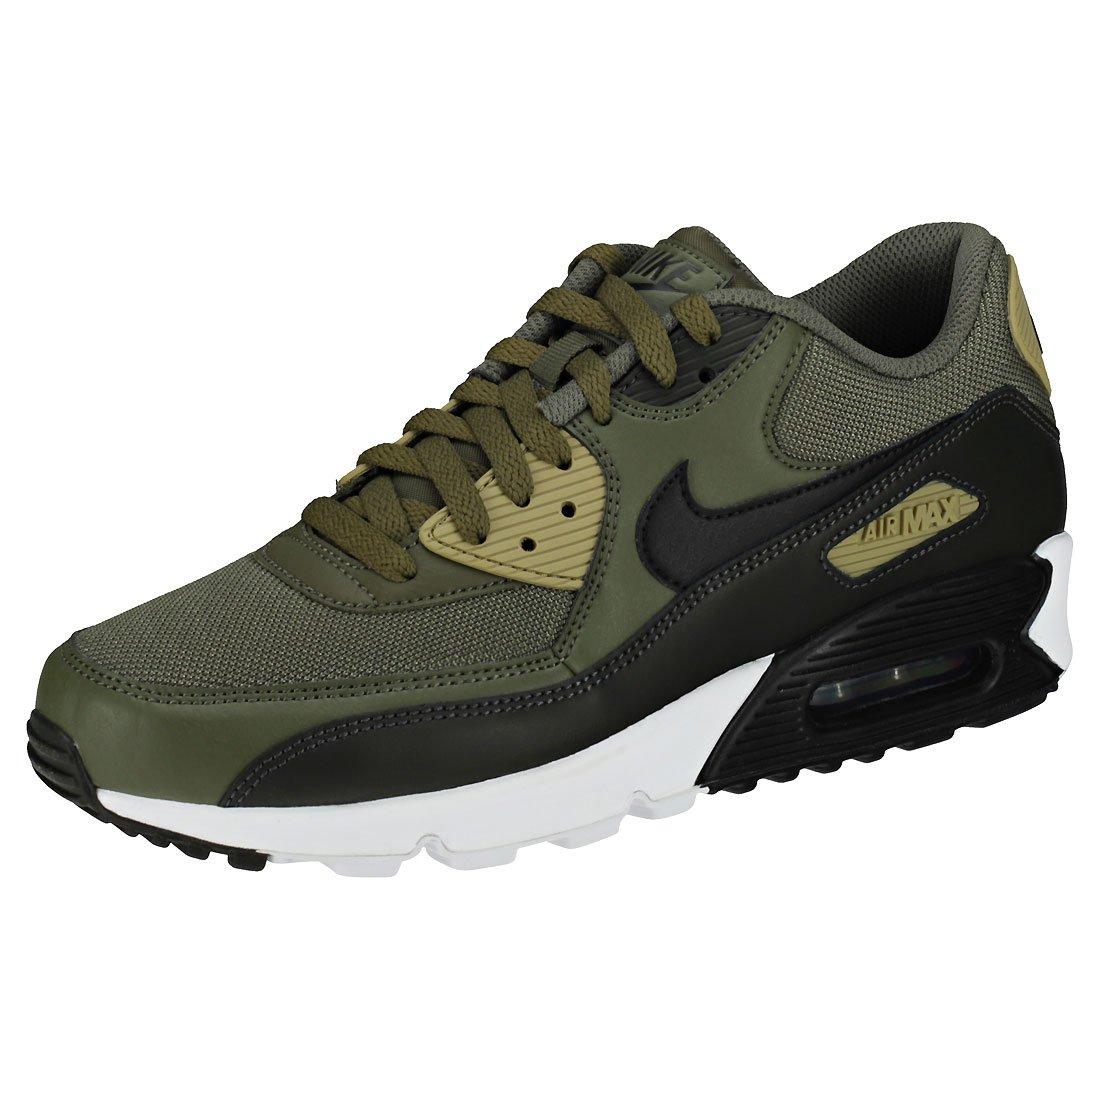 4cba9e55926b4b Galleon - NIKE Mens Air Max 90 Essential Running Shoes Medium  Olive Black Sequoia AJ1285-201 Size 10